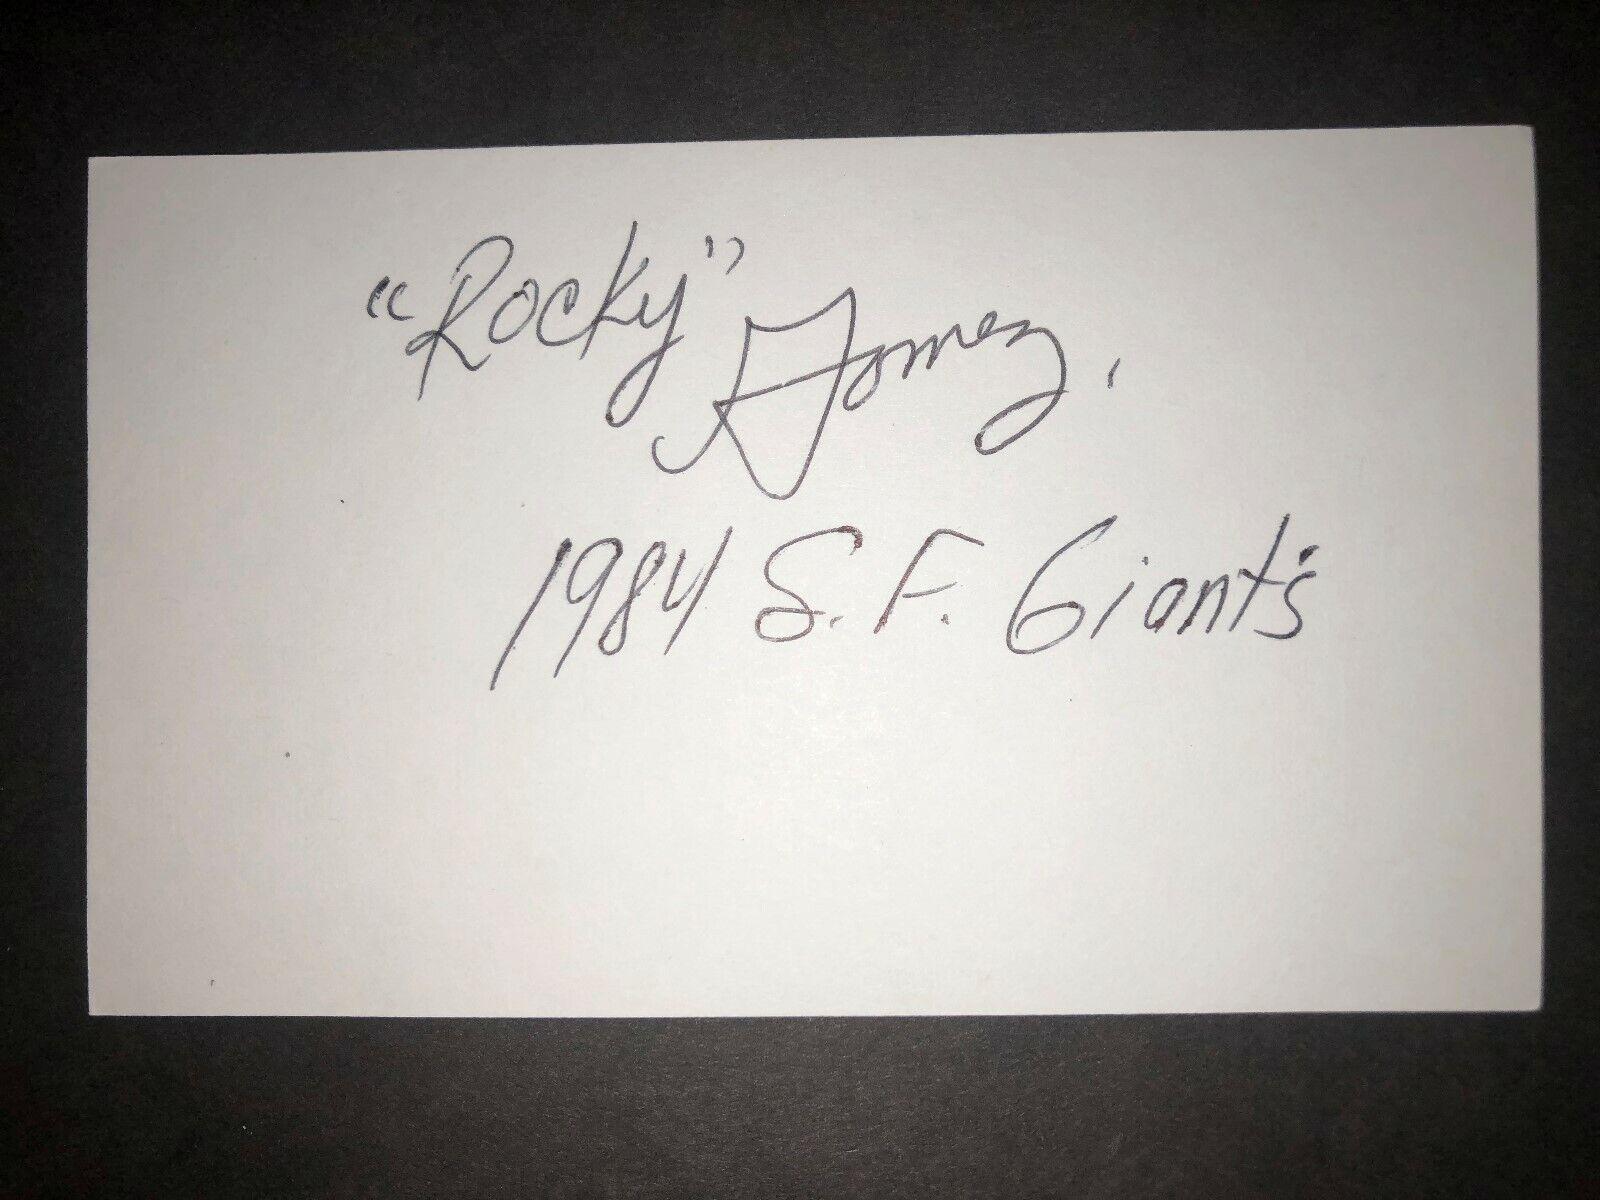 1984 GIANTS Rocky Gomez, SIGNED 3x5 Card JS  - $1.99